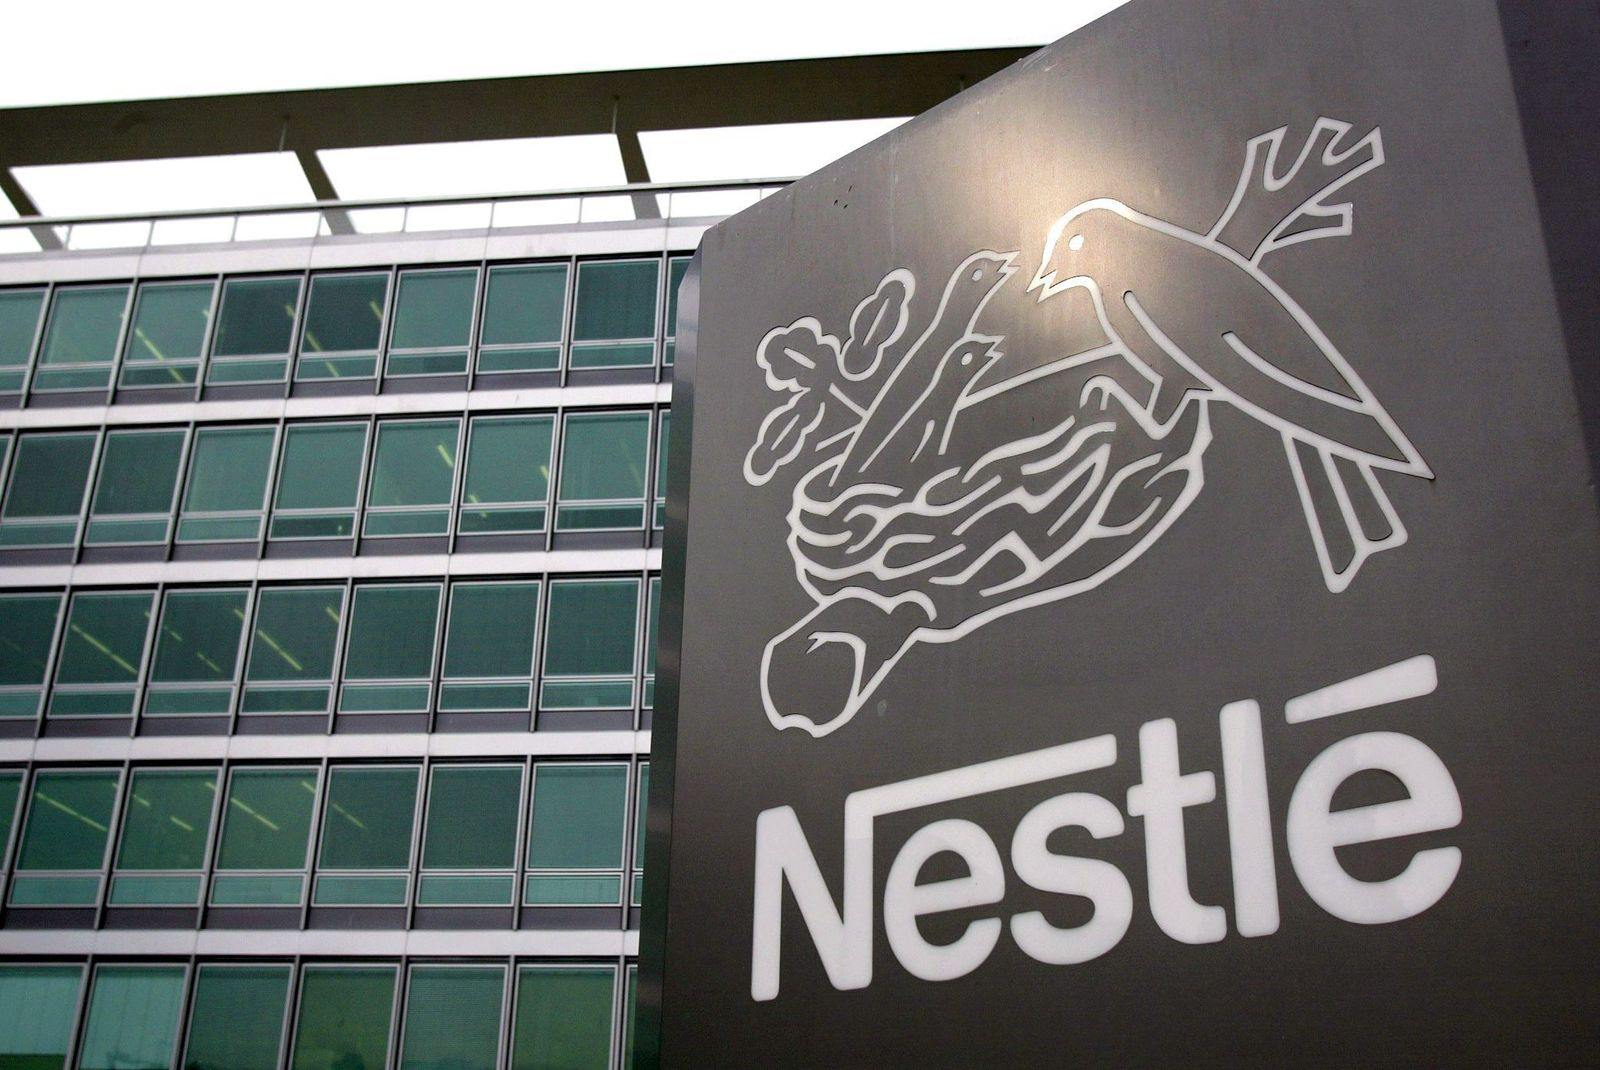 Nestlé steigert Umsatz und bestätigt Ausblick